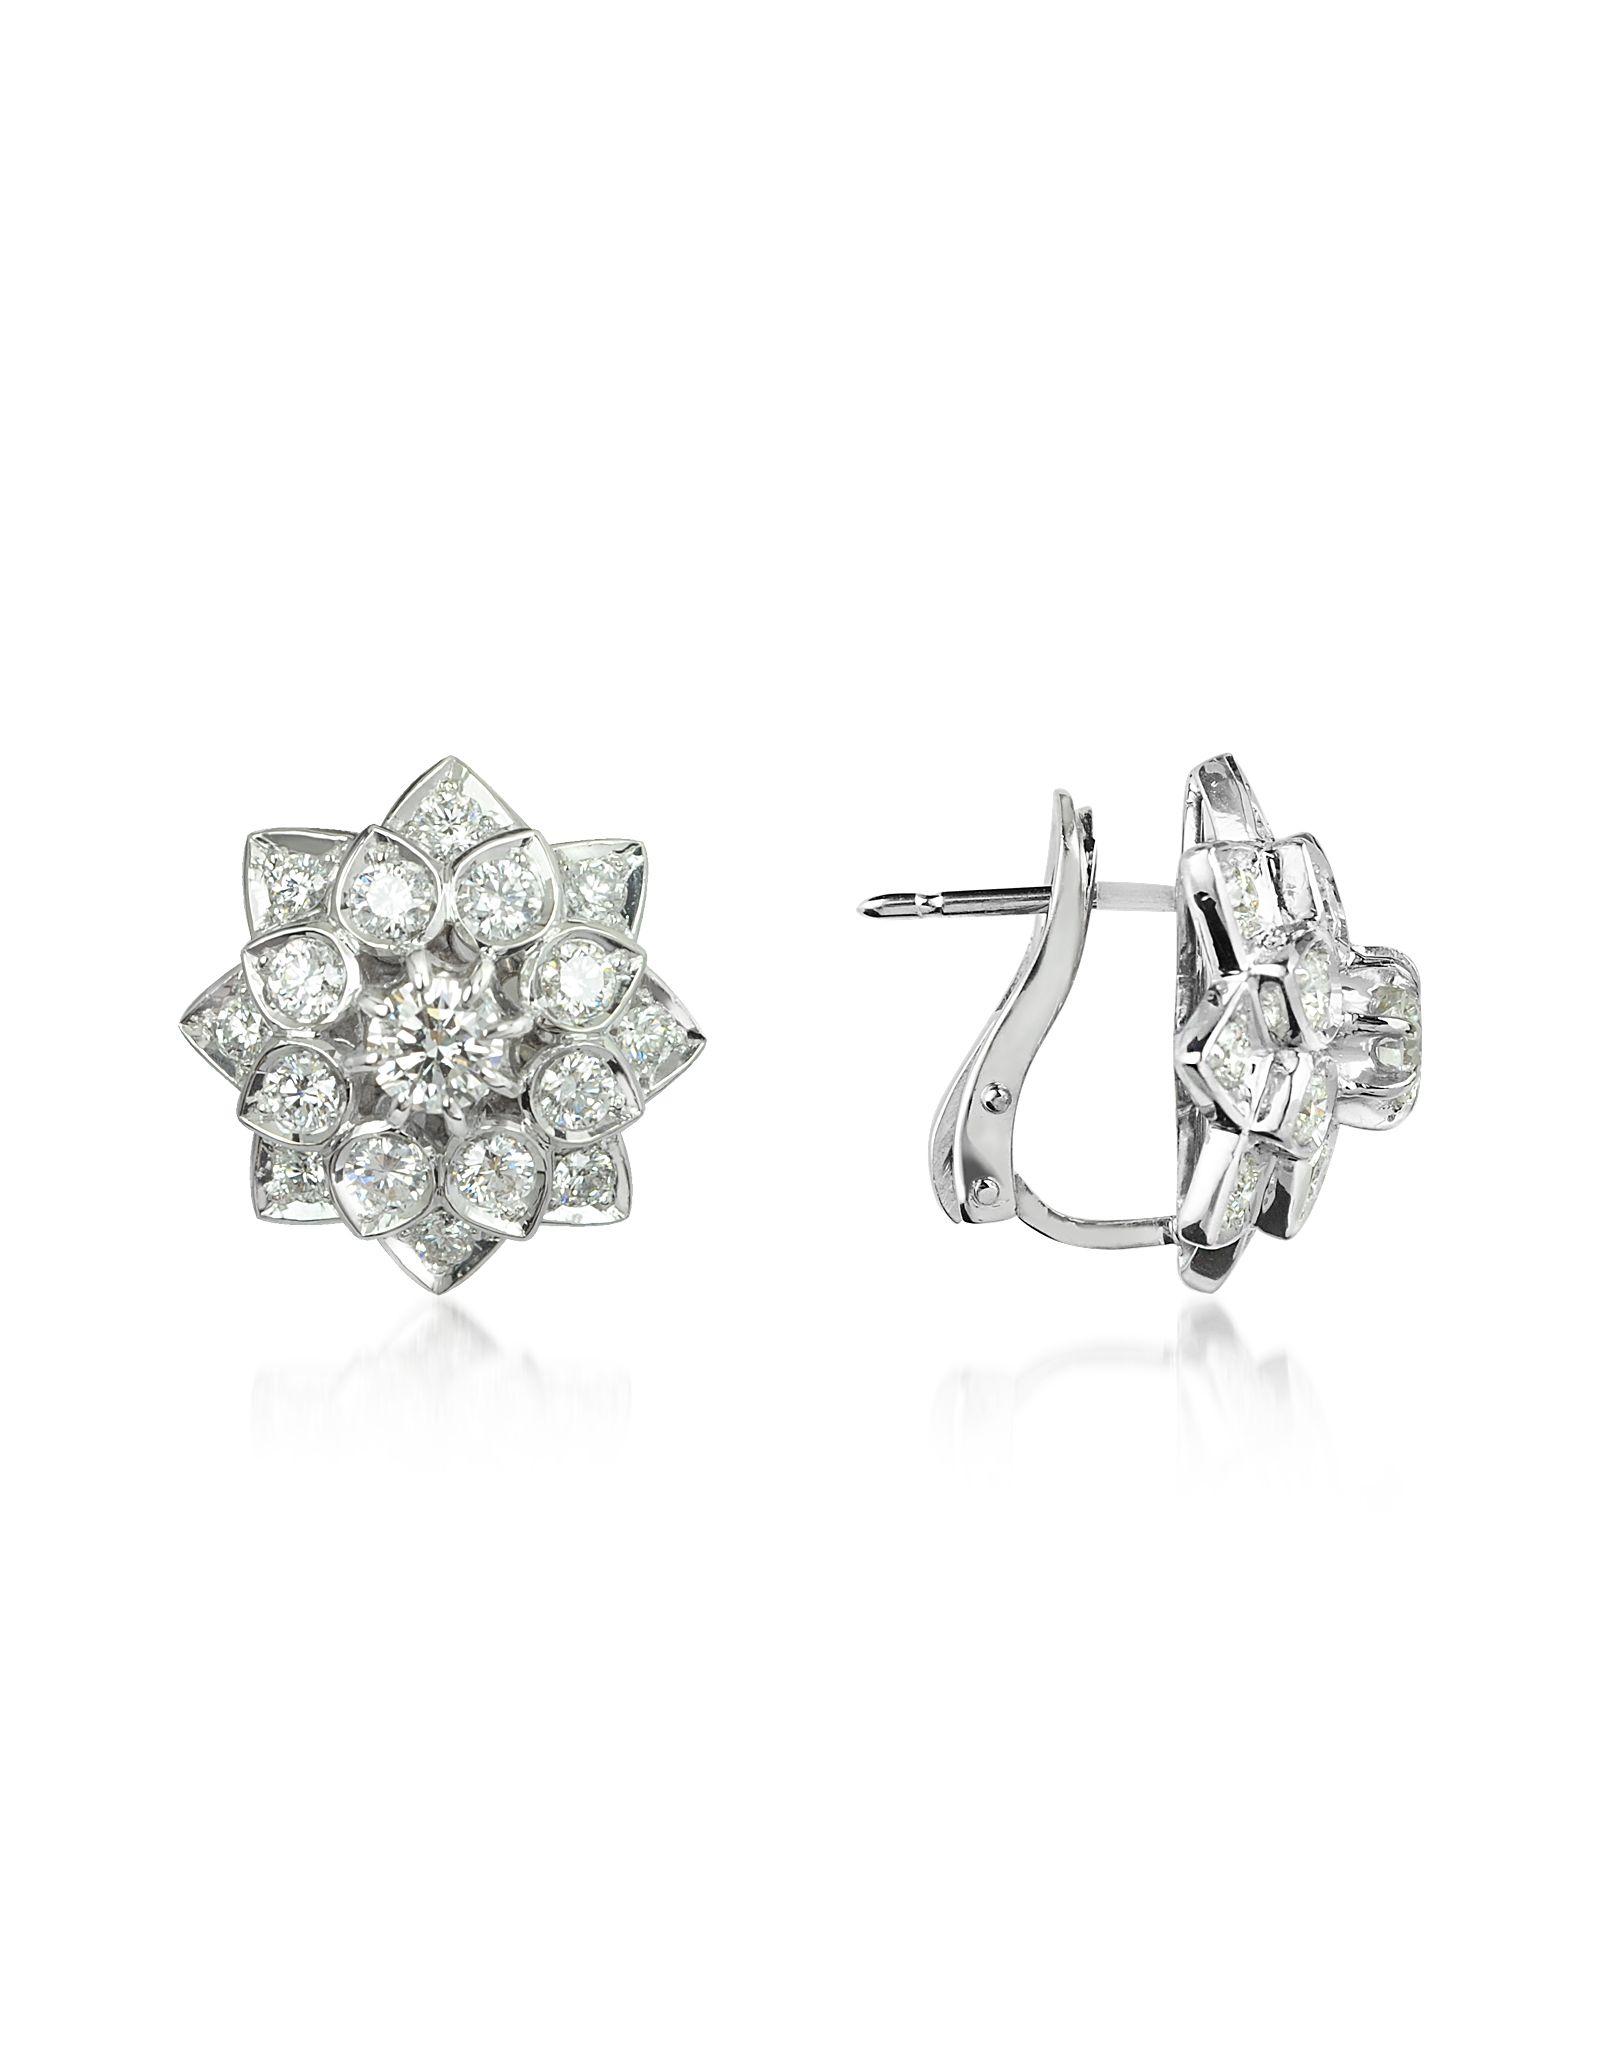 Incanto Royale 2.2 ctw Diamond 18K Gold Earrings 18k